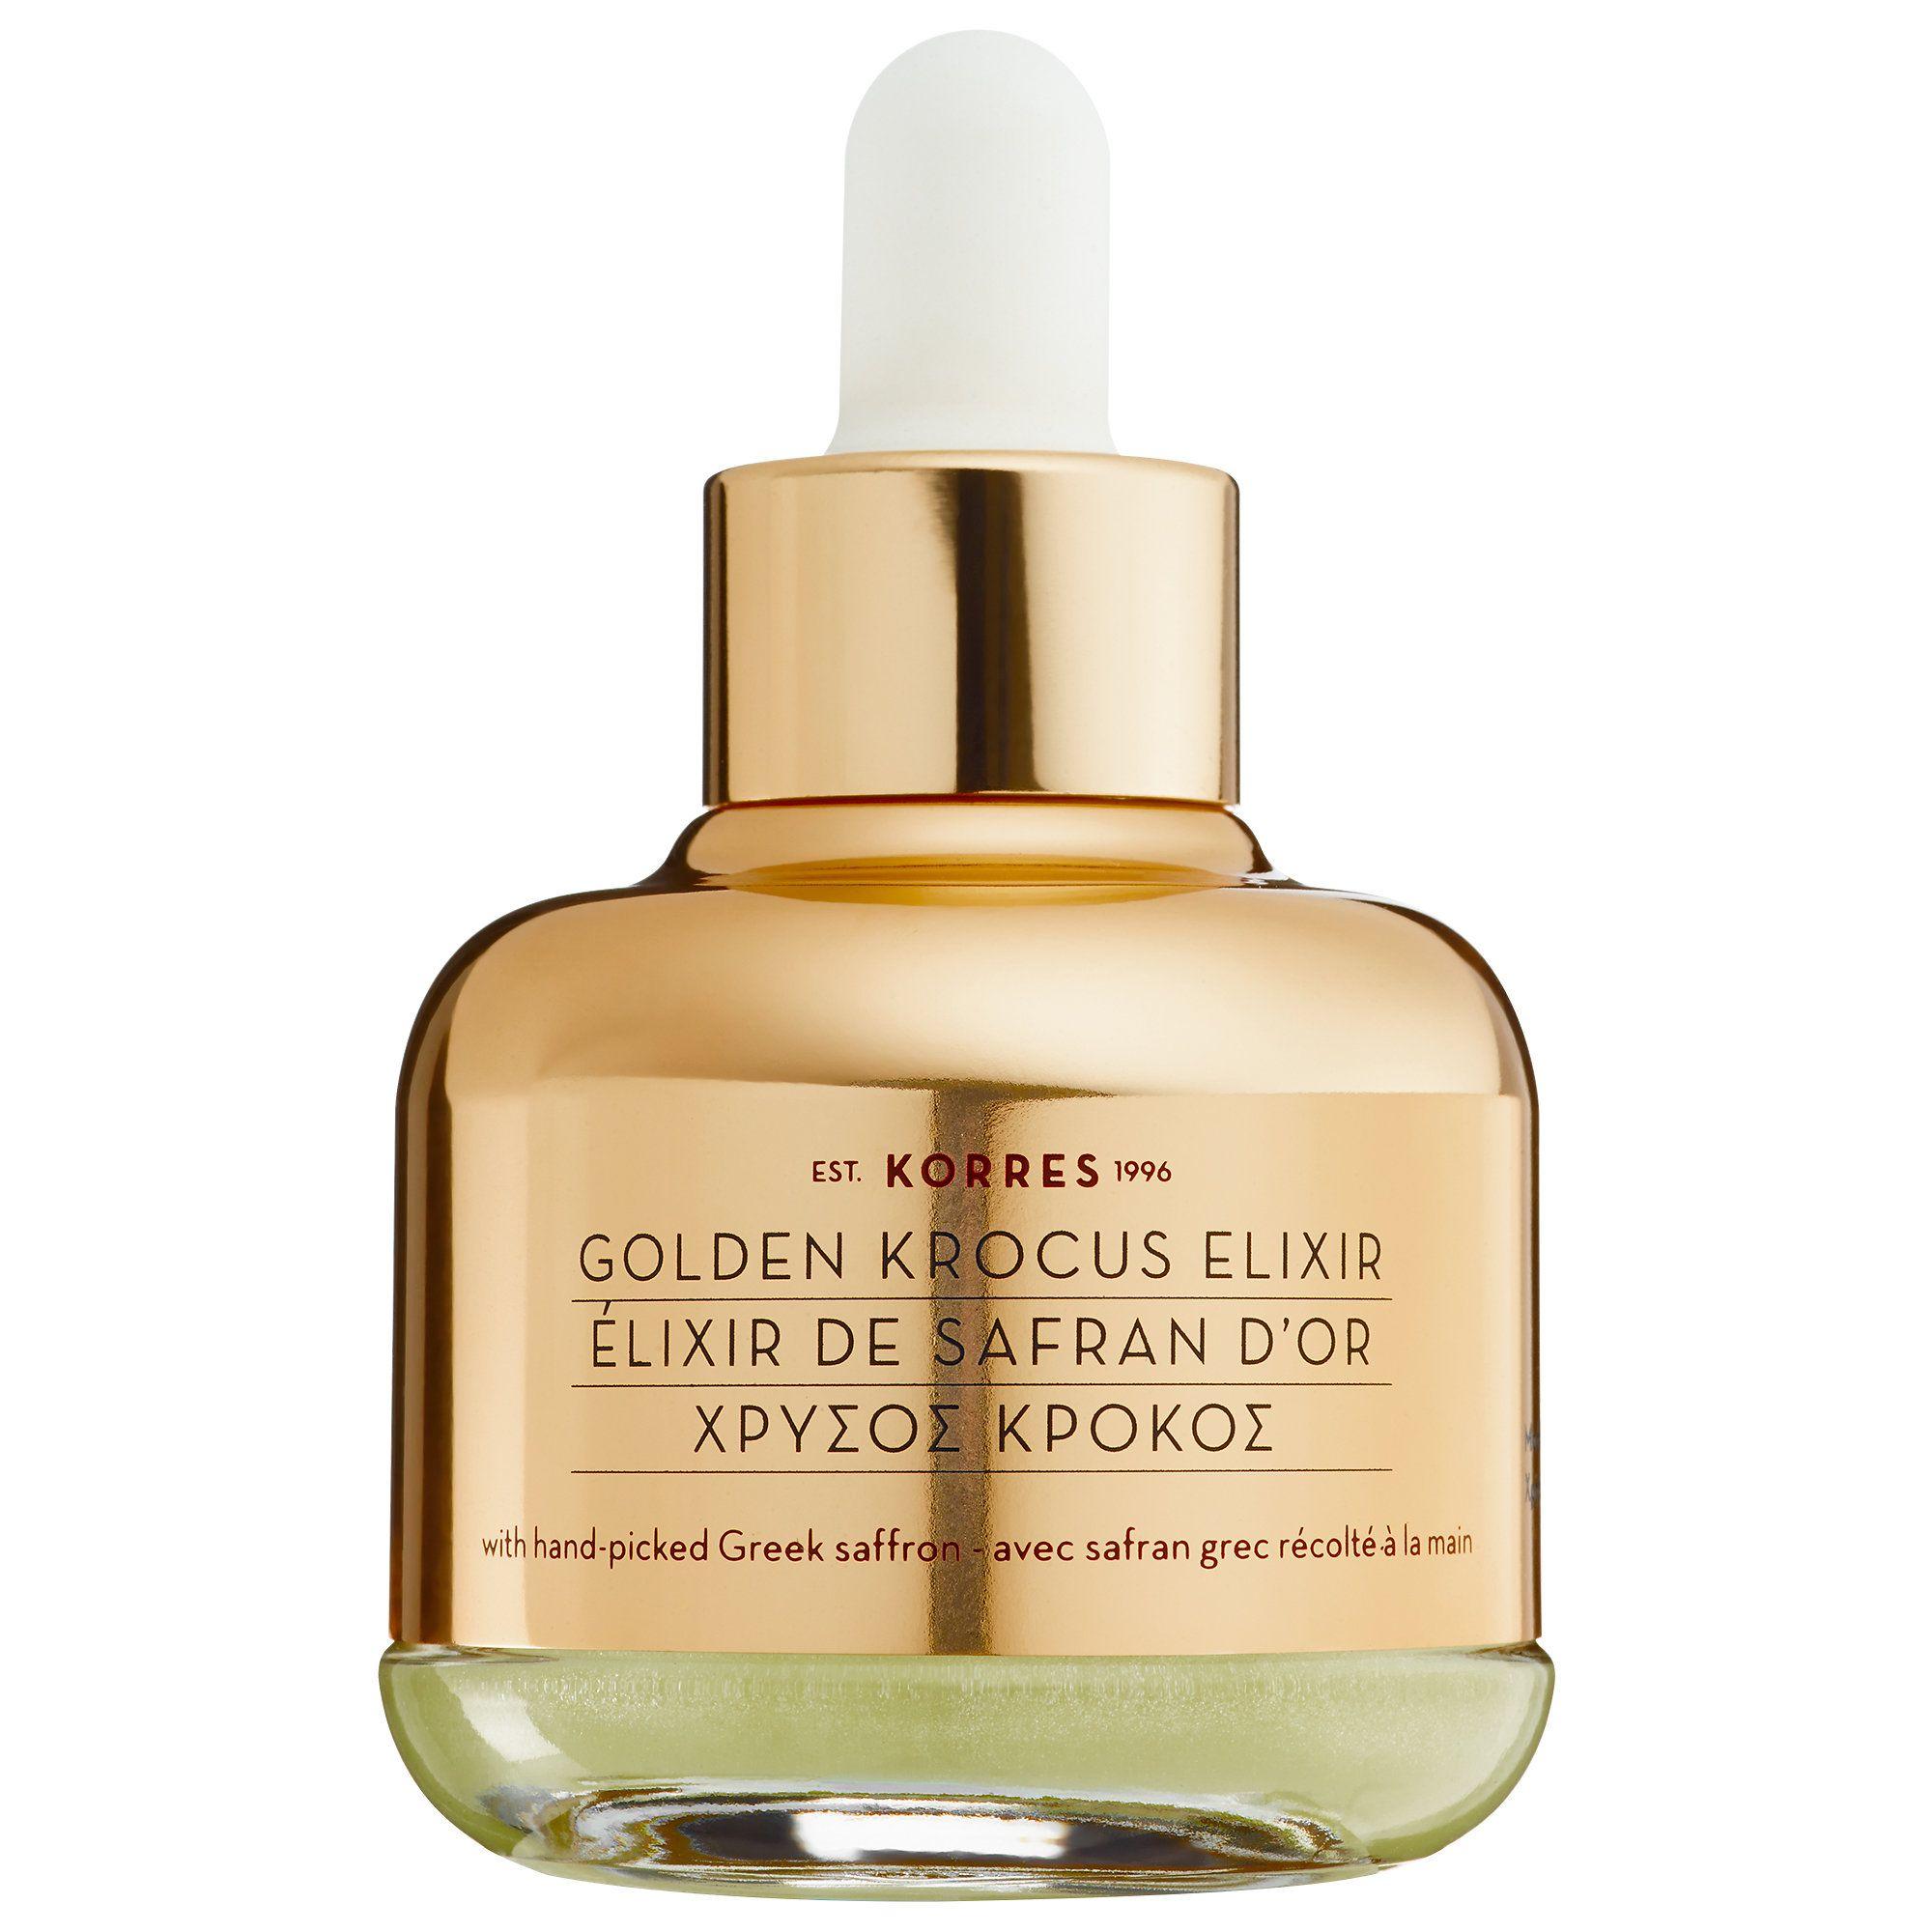 Korres Golden Krocus Elixir, Ελιξήριο Ομορφιάς & Νεότητας με Χρυσό Κρόκο 30ml. Μάθετε περισσότερα ΕΔΩ: https://www.pharm24.gr/index.php?main_page=product_info&products_id=12878